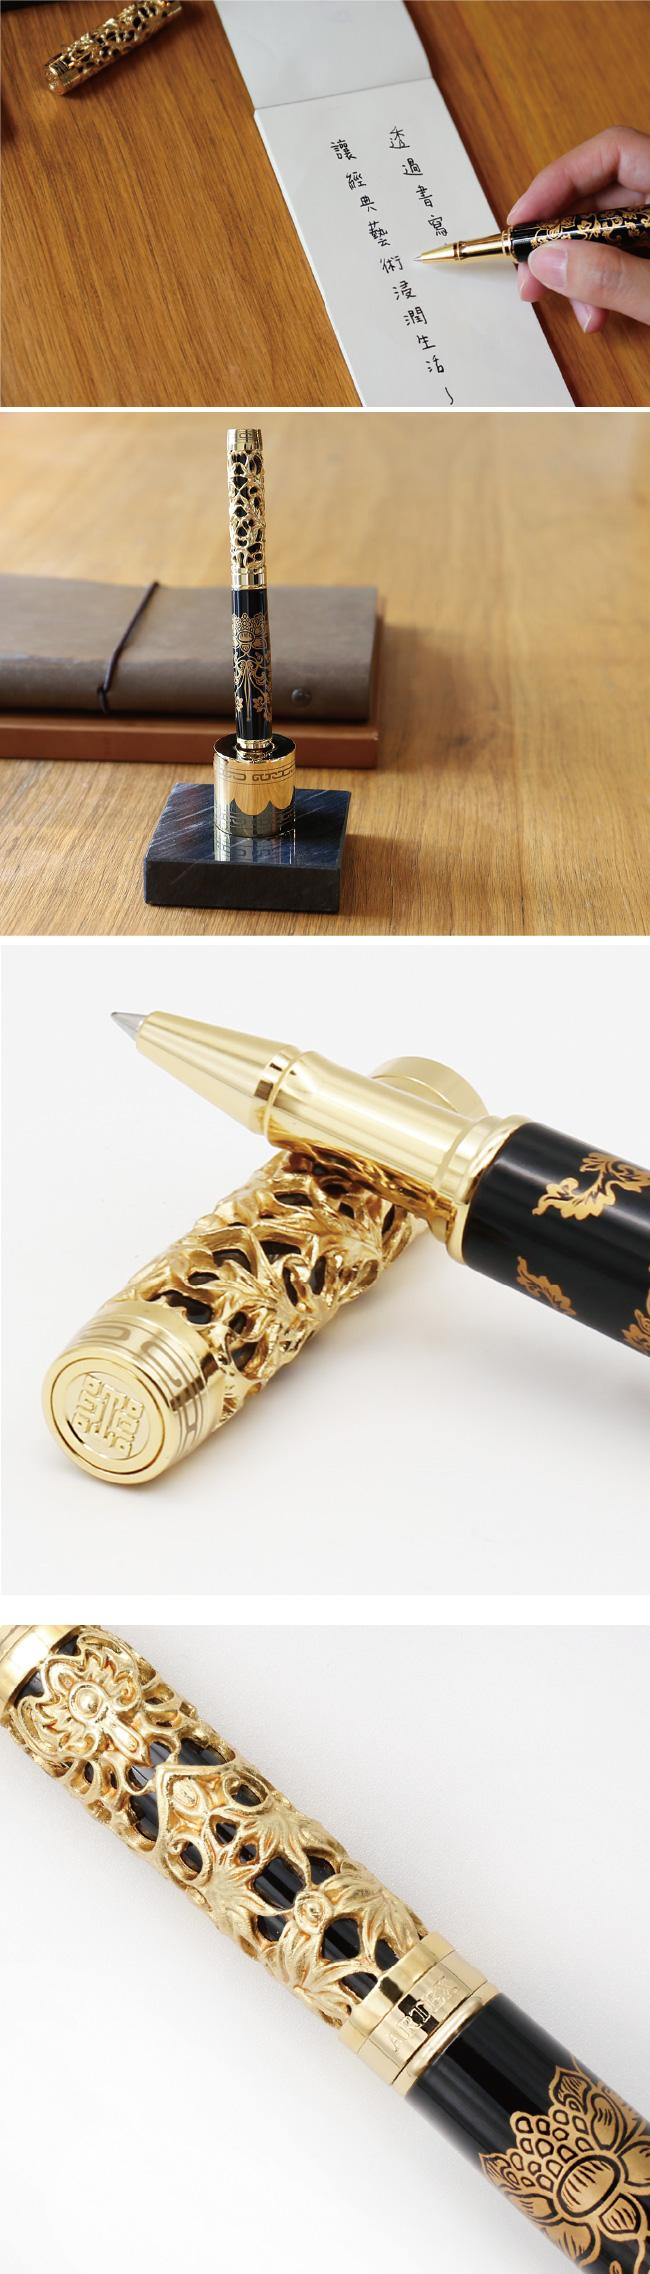 ARTEX|國立故宮博物院聯名 金番花鋼珠筆禮盒